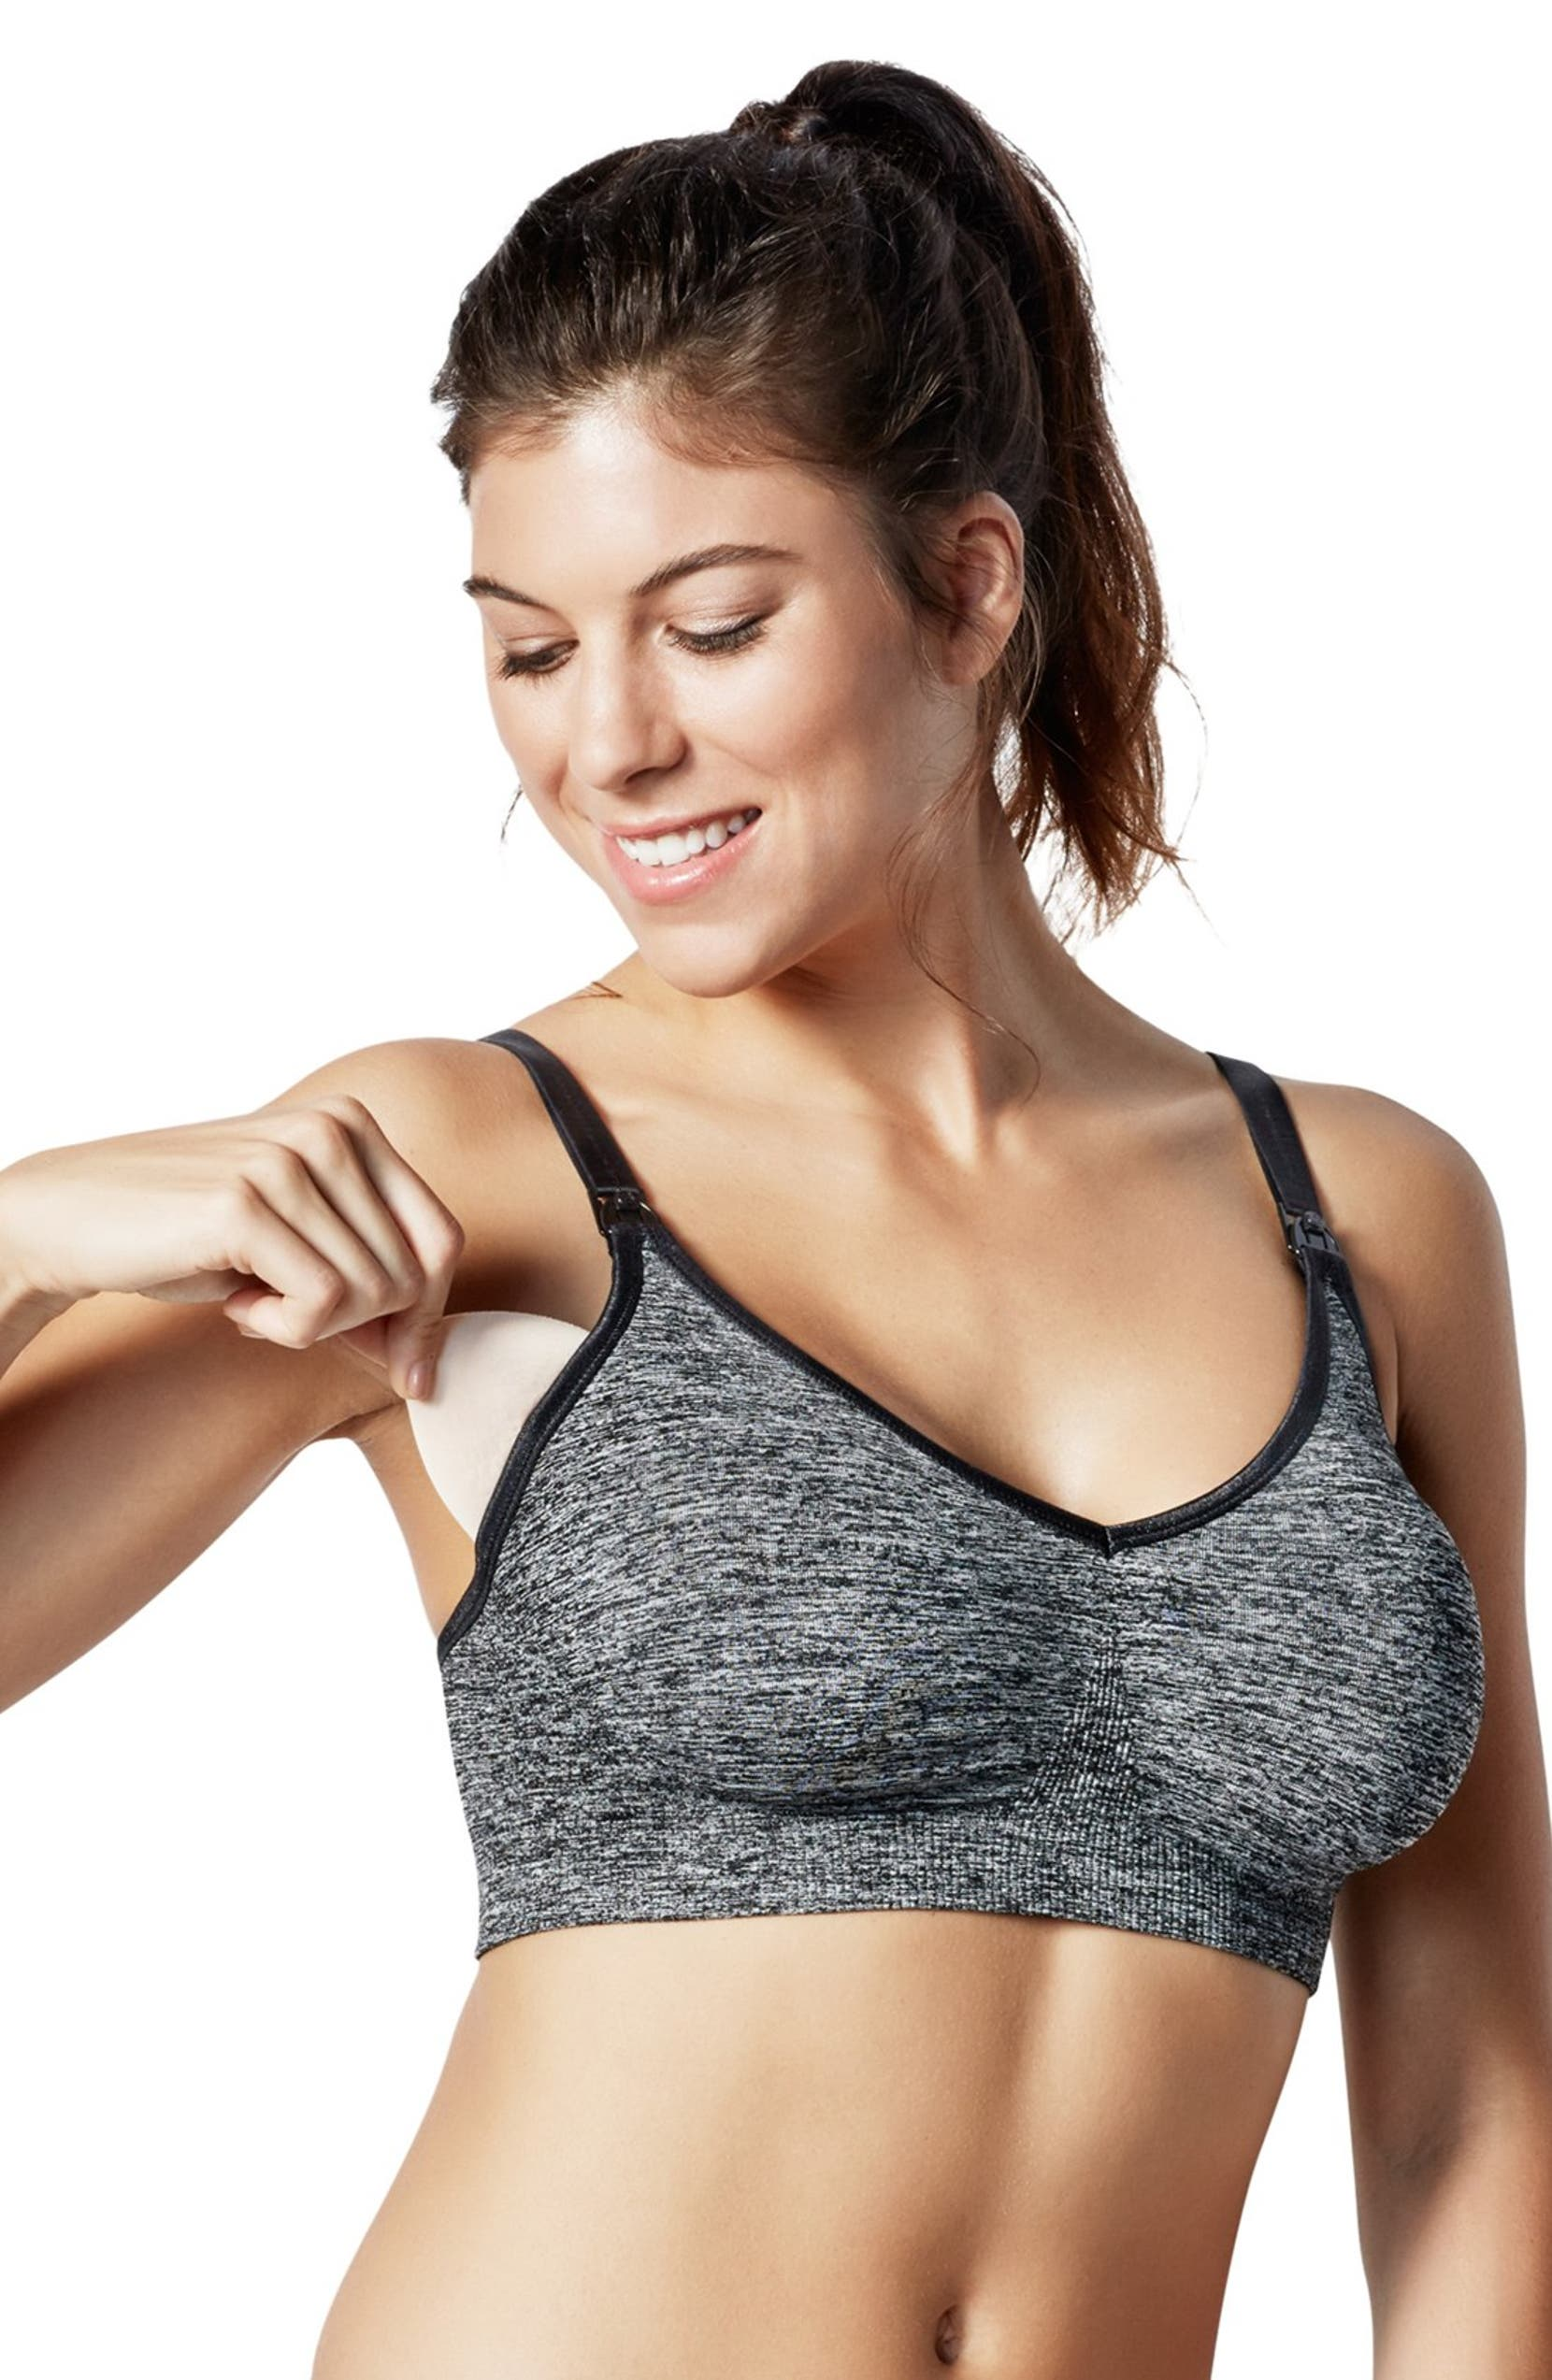 636a6a4e2 Bravado Designs  Body Silk  Seamless Yoga Maternity Nursing Bra ...